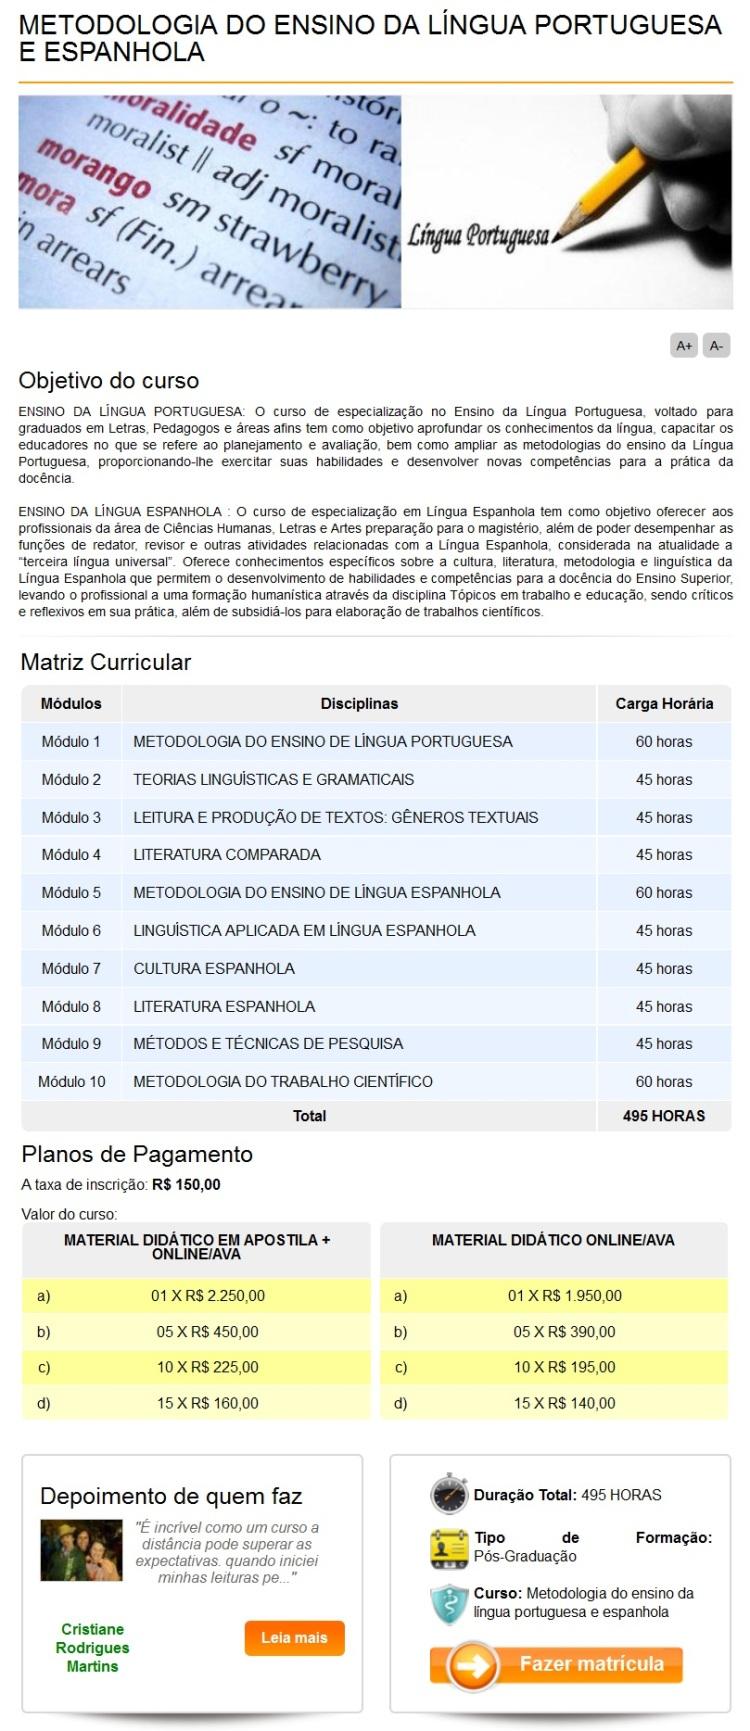 METODOLOGIA DO ENSINO DA LINGUA PORTUGUESA E ESPANHOLA